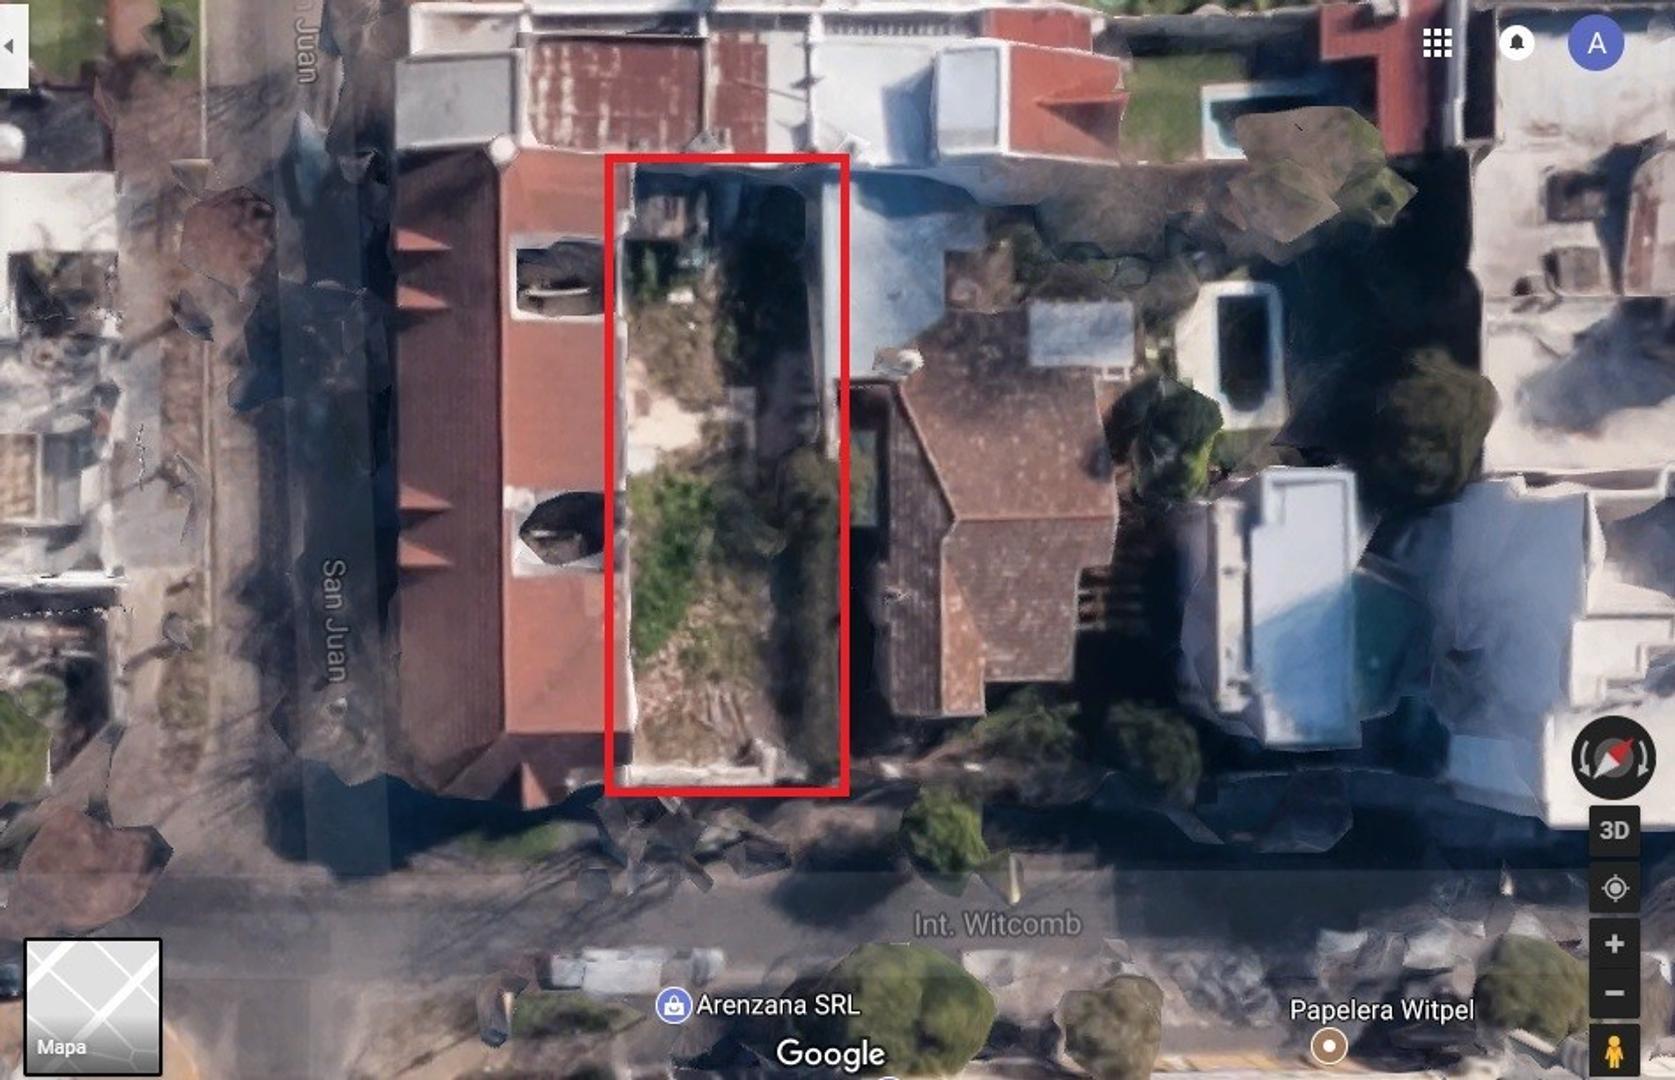 Terreno 10x30 con proyecto 1150 m2 ingresado ex zona RA actual RM2